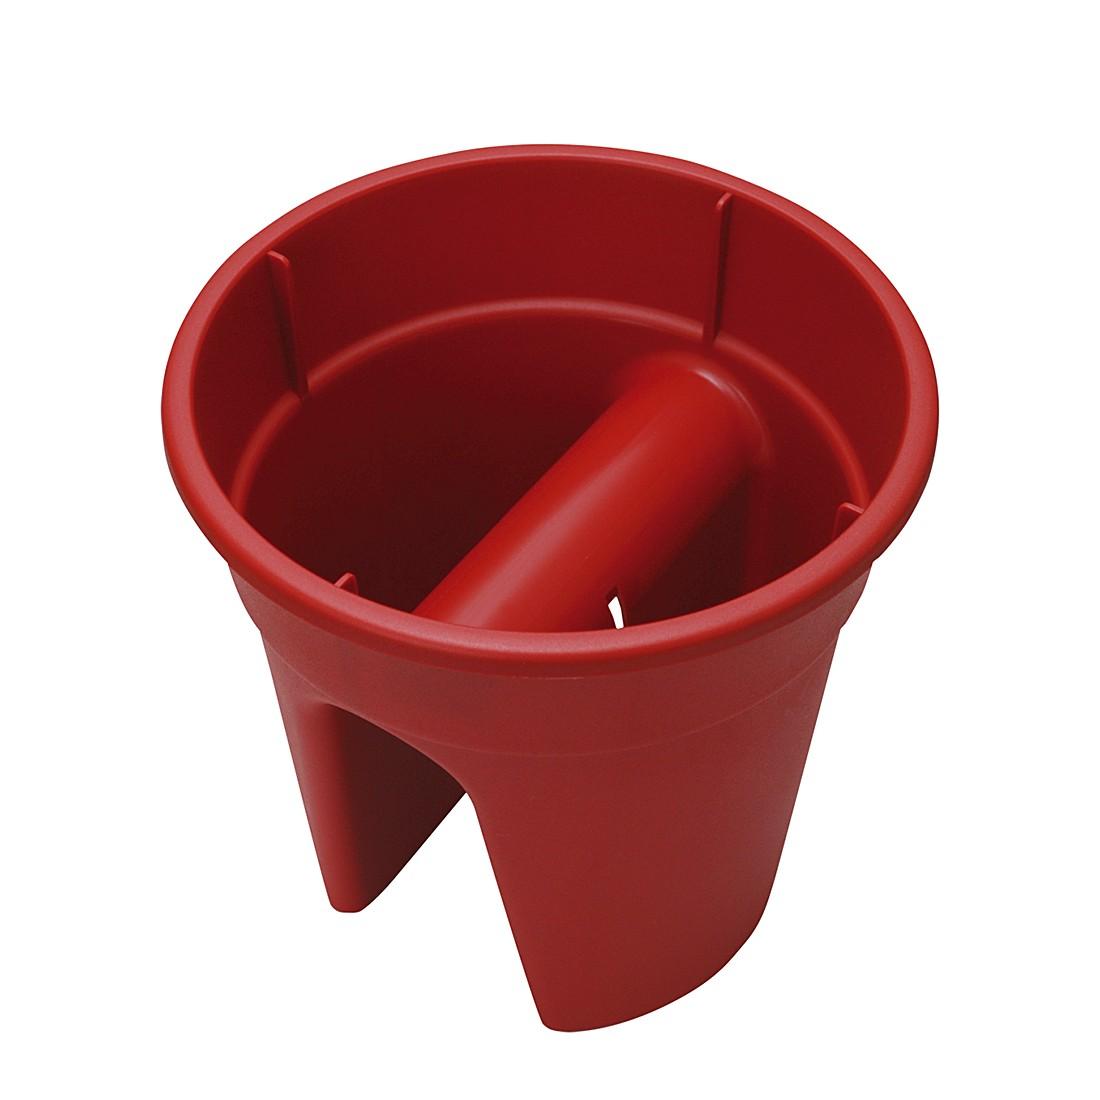 Blumentopf Flowerclip (3er-Set) – Kunststoff Rot, Khw bestellen